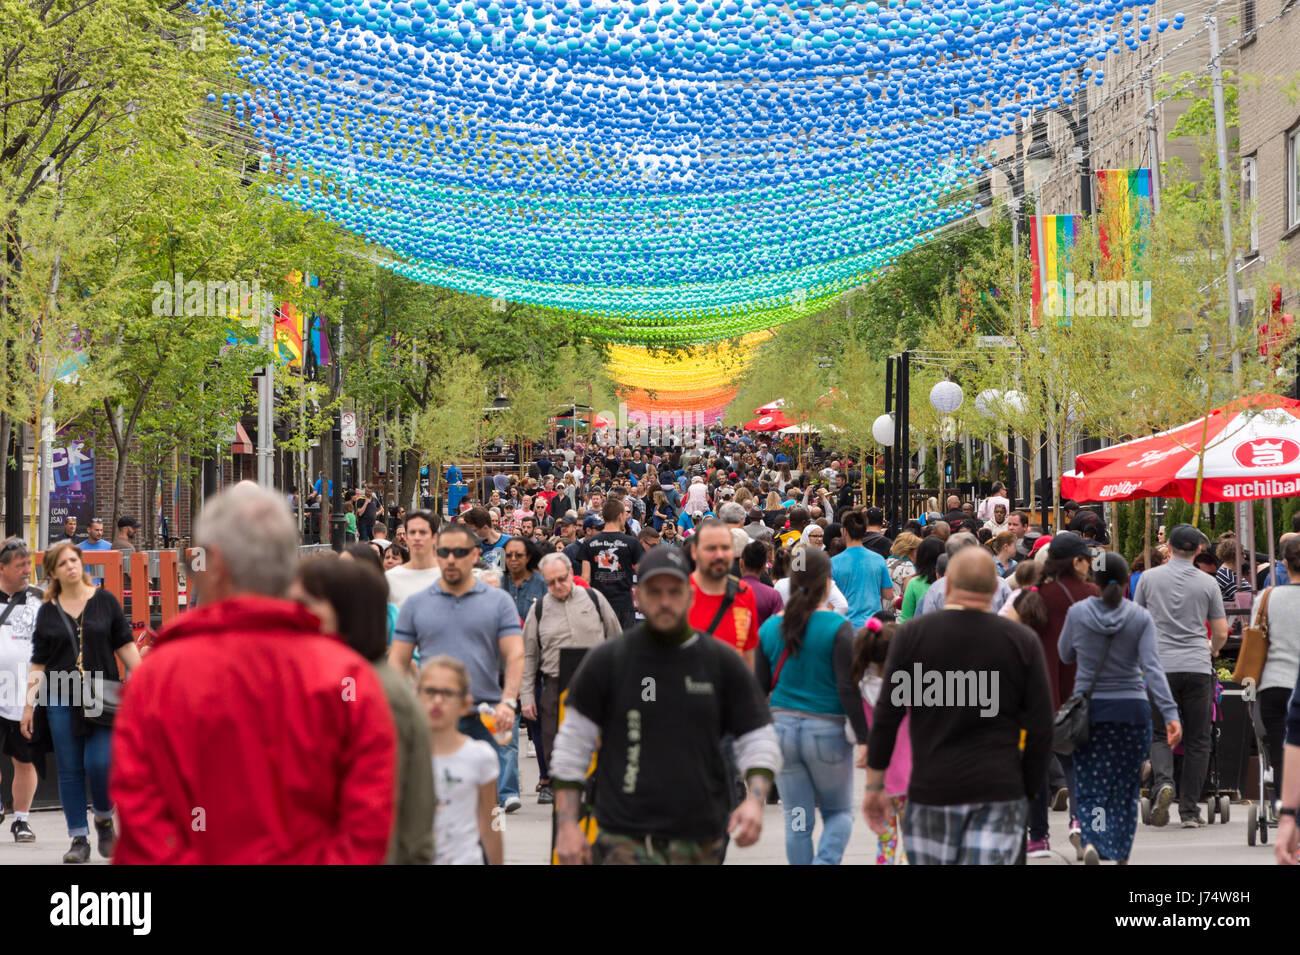 Montreal, CA - 21 May 2017: Rainbow balls art installation '18 shades of gay' on Saint-Catherine Street - Stock Image